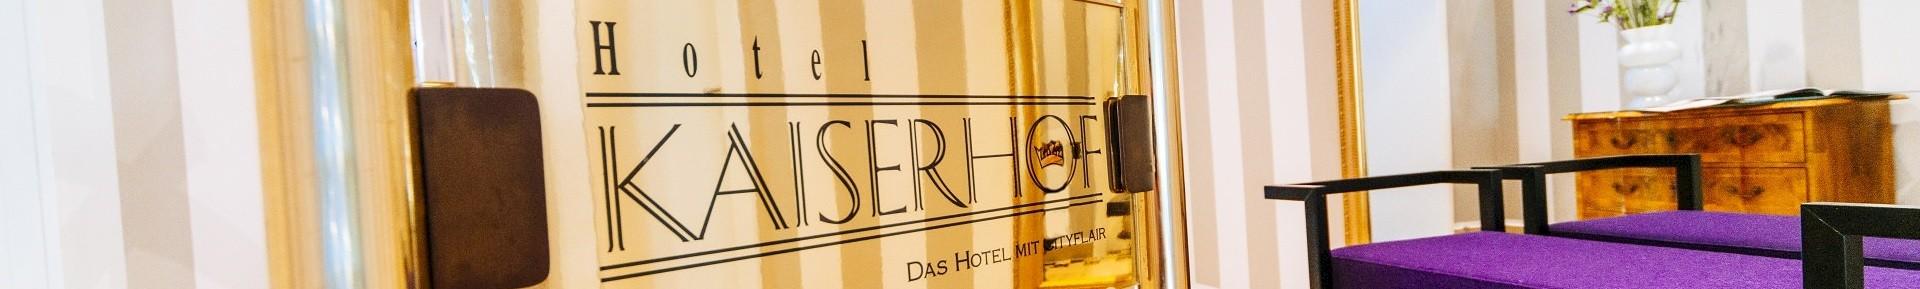 Datenschutzhinweise Hotel Kaiserhof Münster